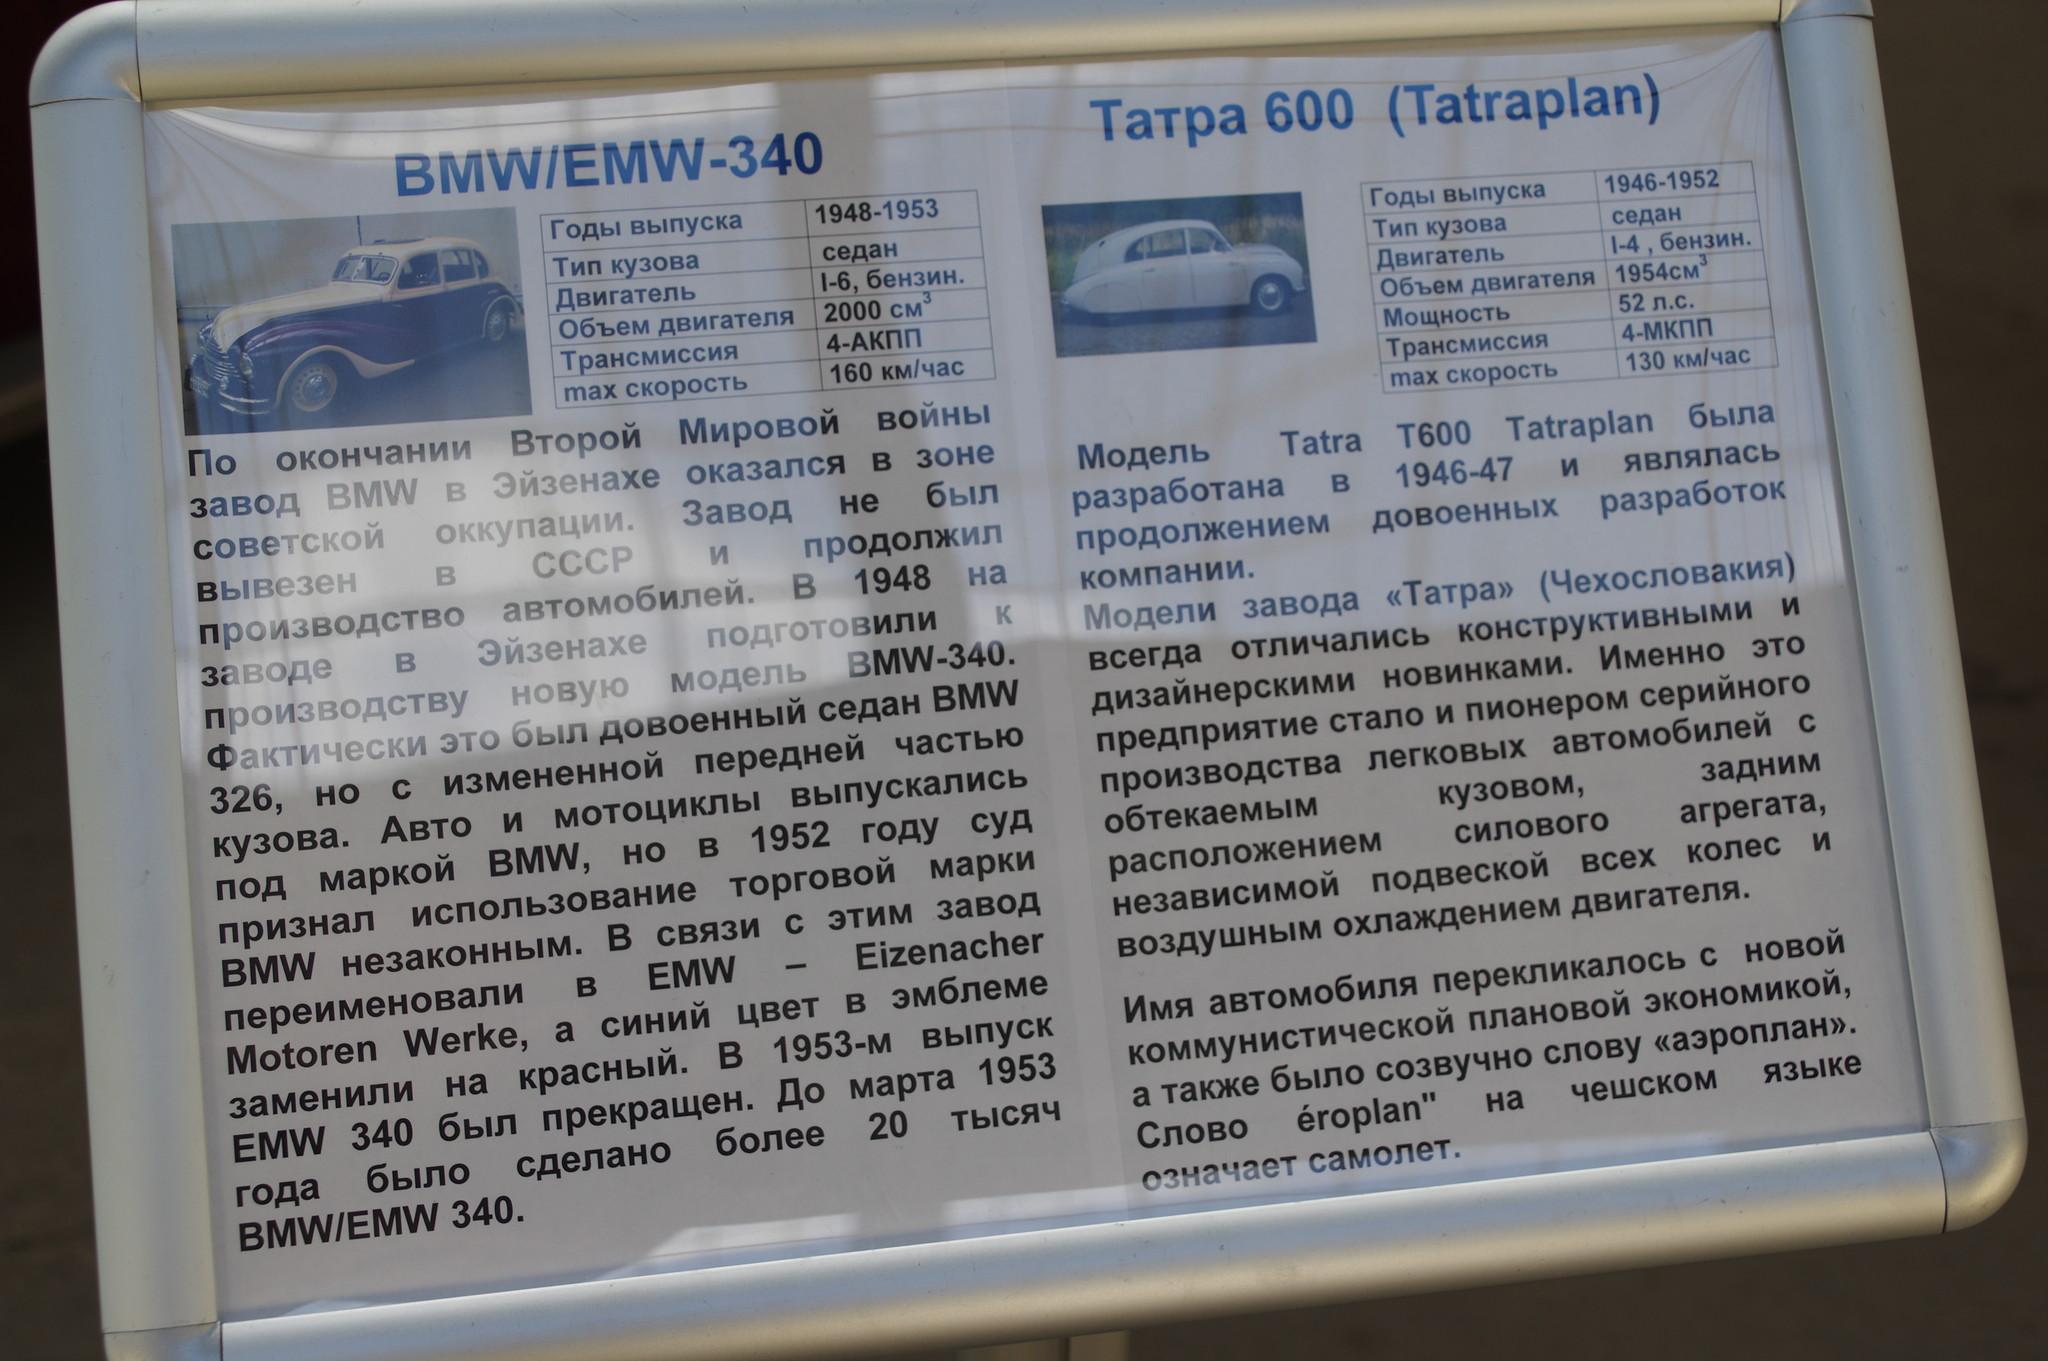 Автомобиль BMW/EMW 340